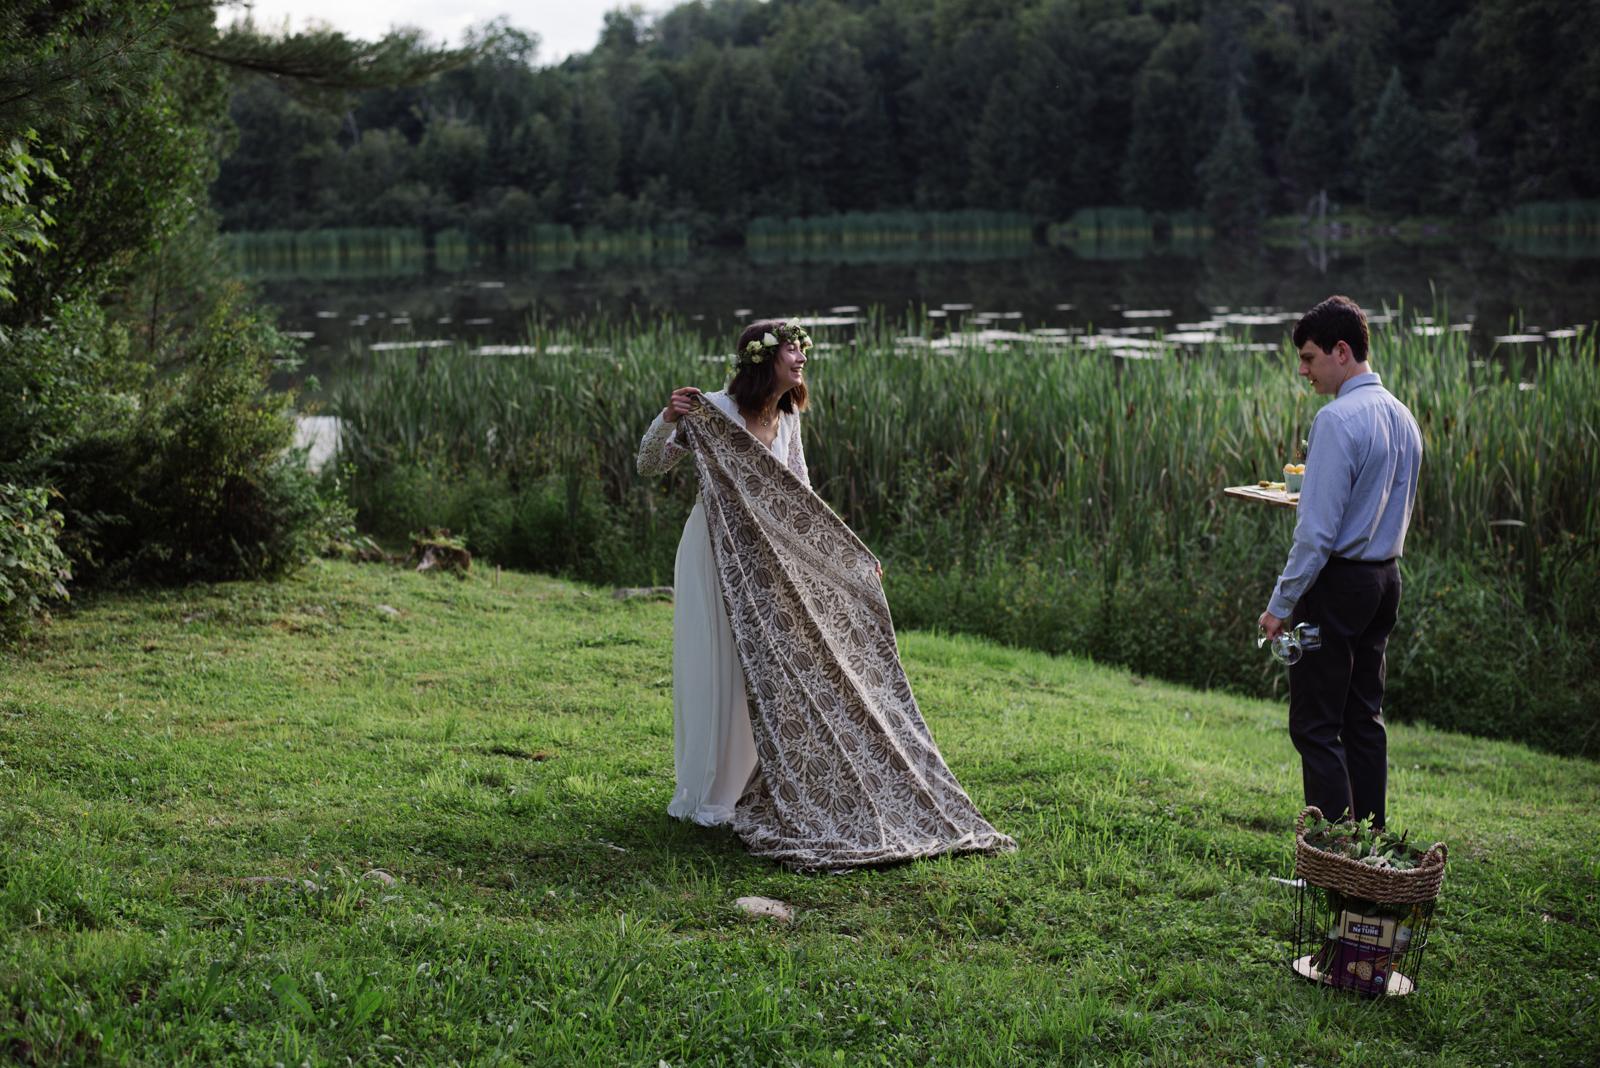 08192018-JessicaJordan-JuliaLuckettPhotography-154.jpg